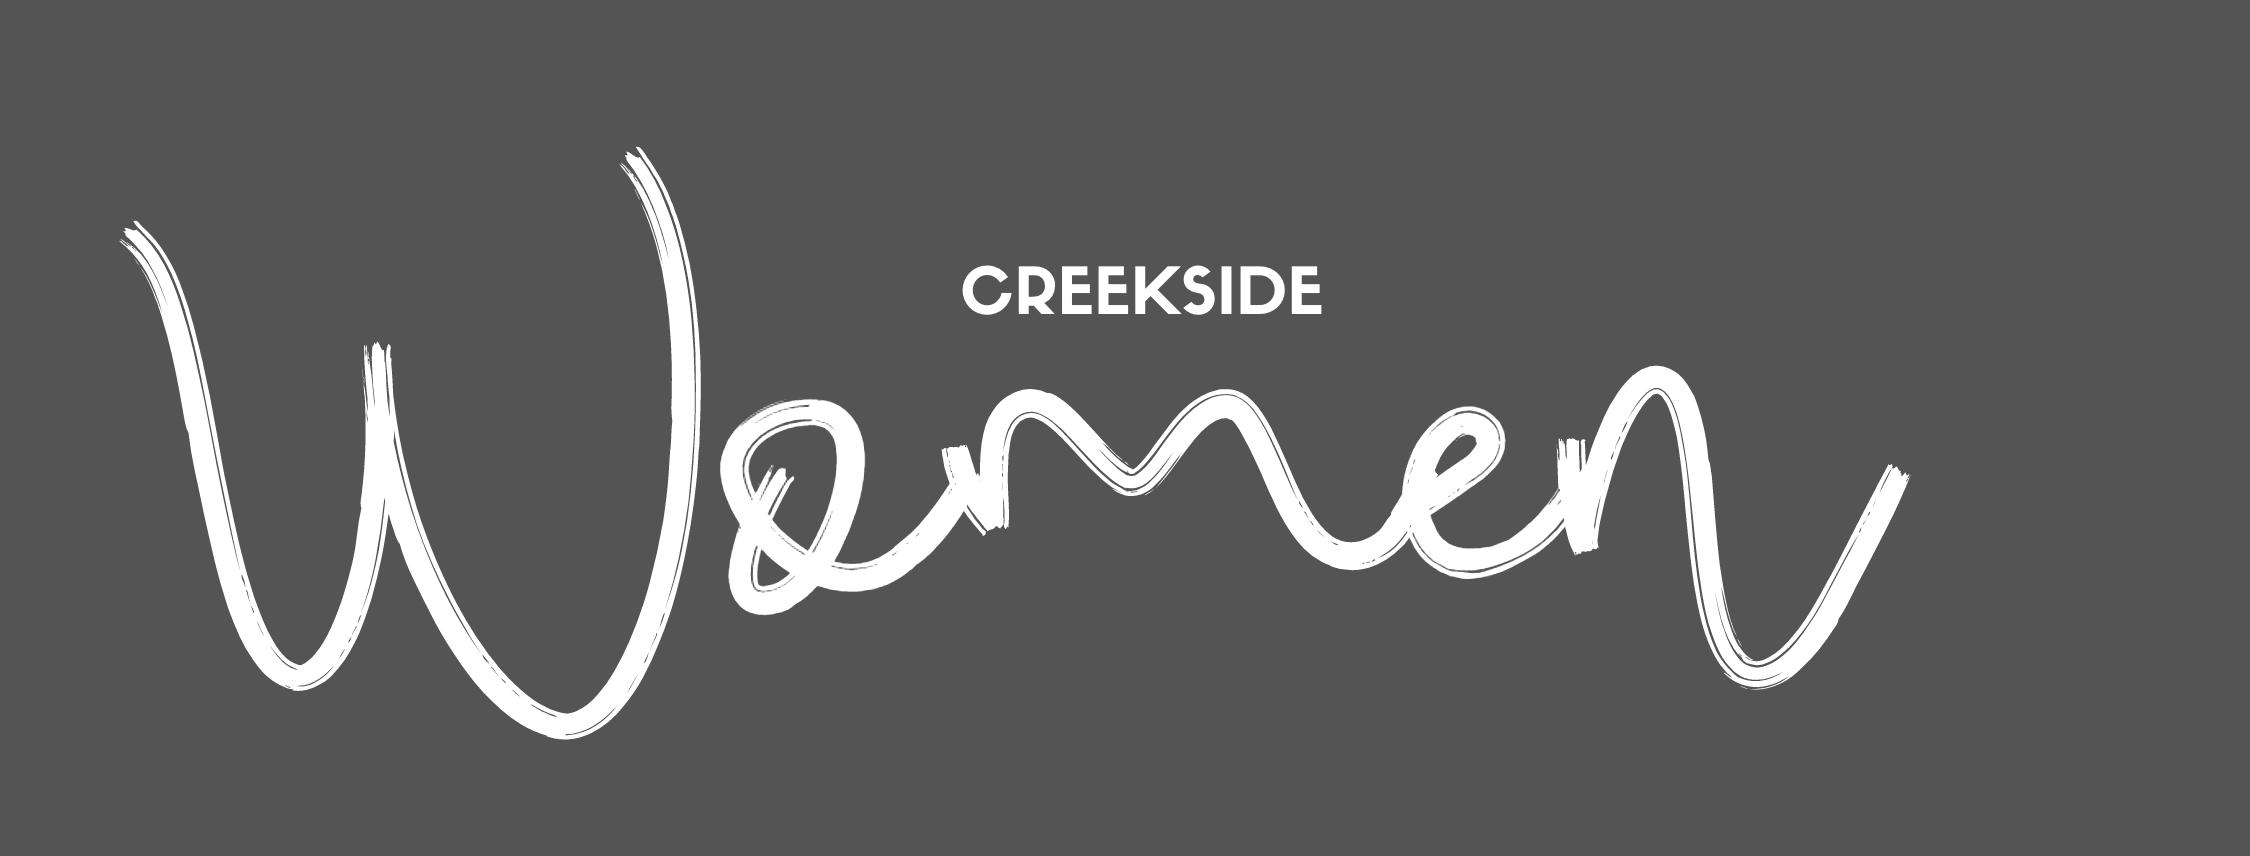 Creekside Women logo.png